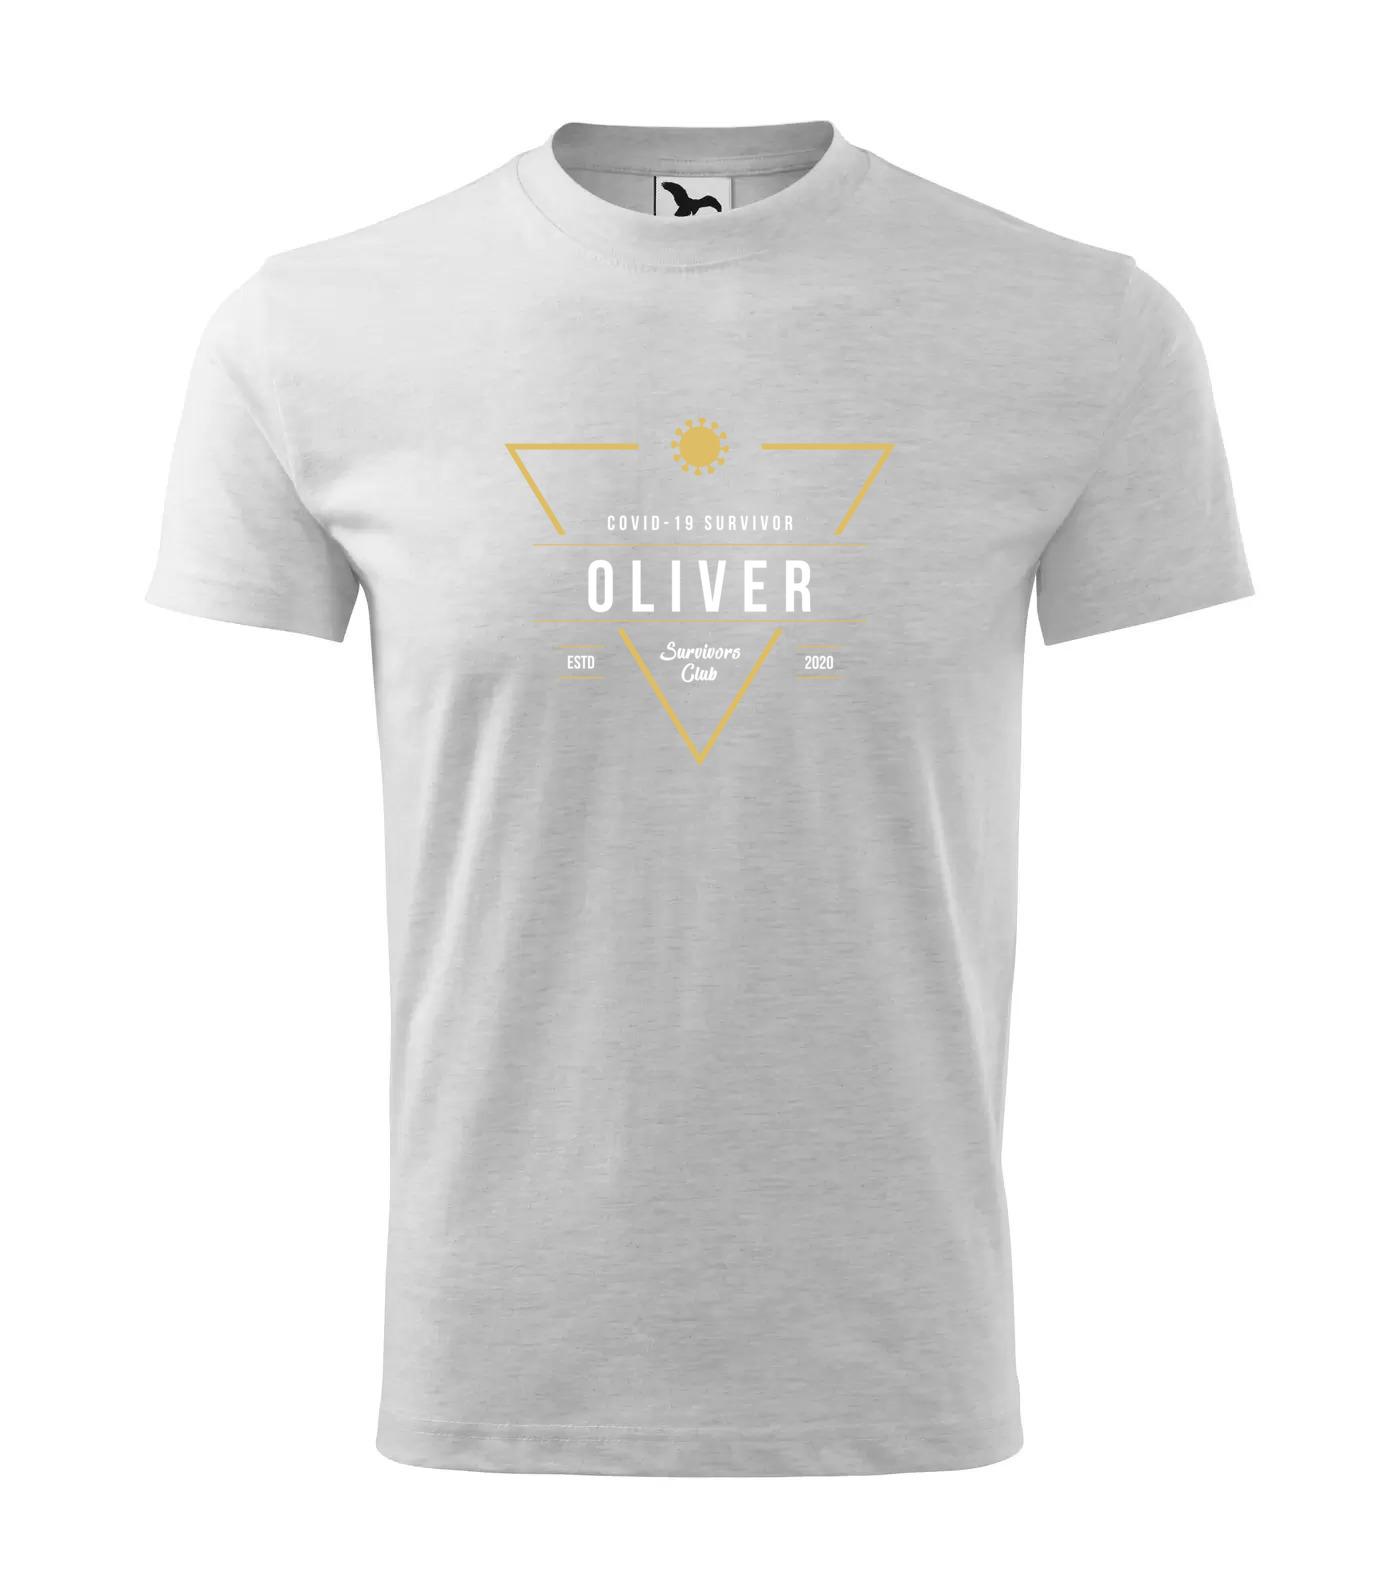 Tričko Survivor Club Oliver